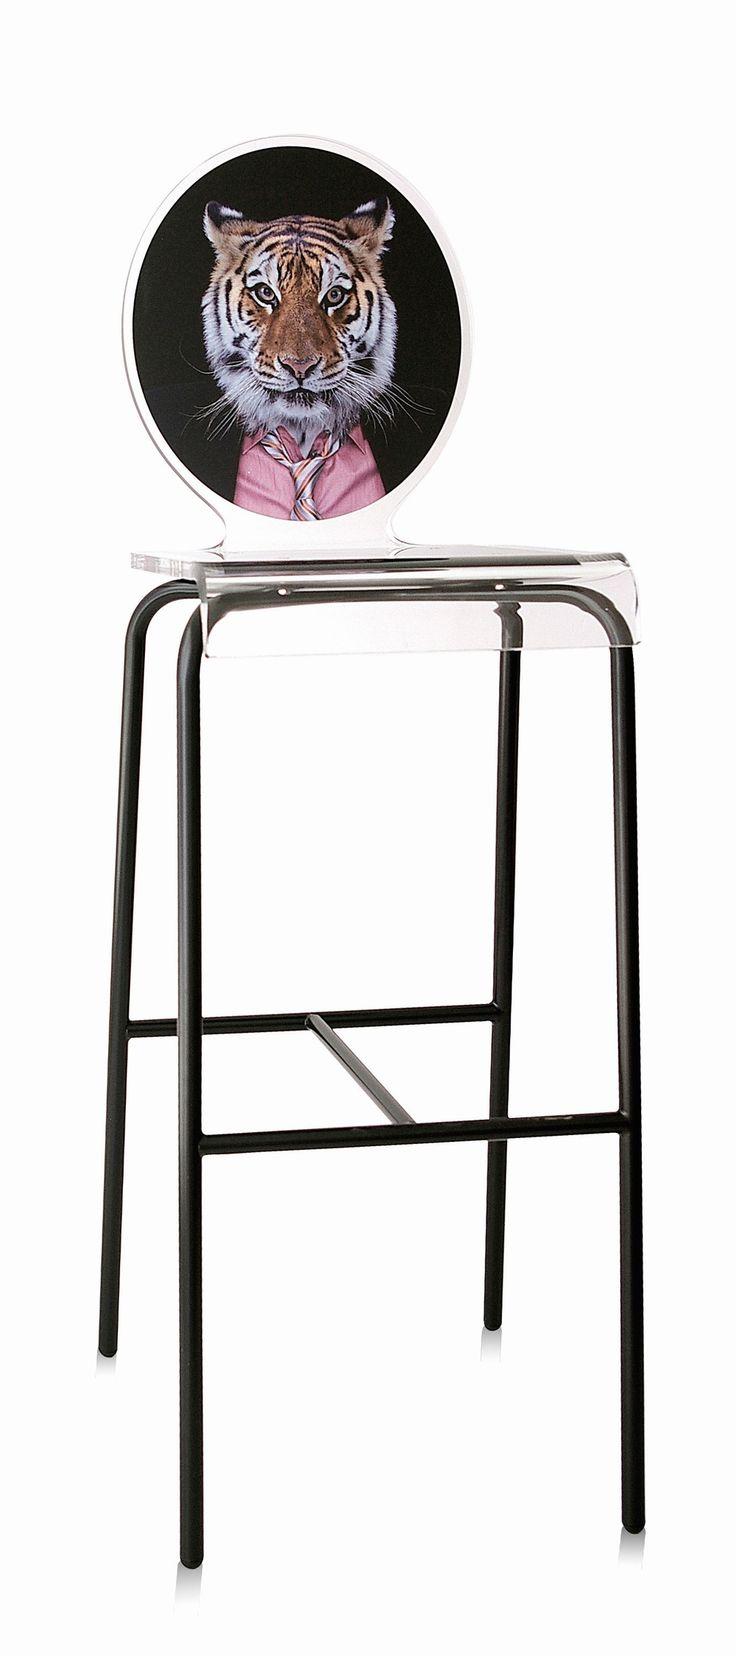 Graph Barstool Tiger £53800  Seating  Bar Stools Buy Vintage, Industrial  & Retro